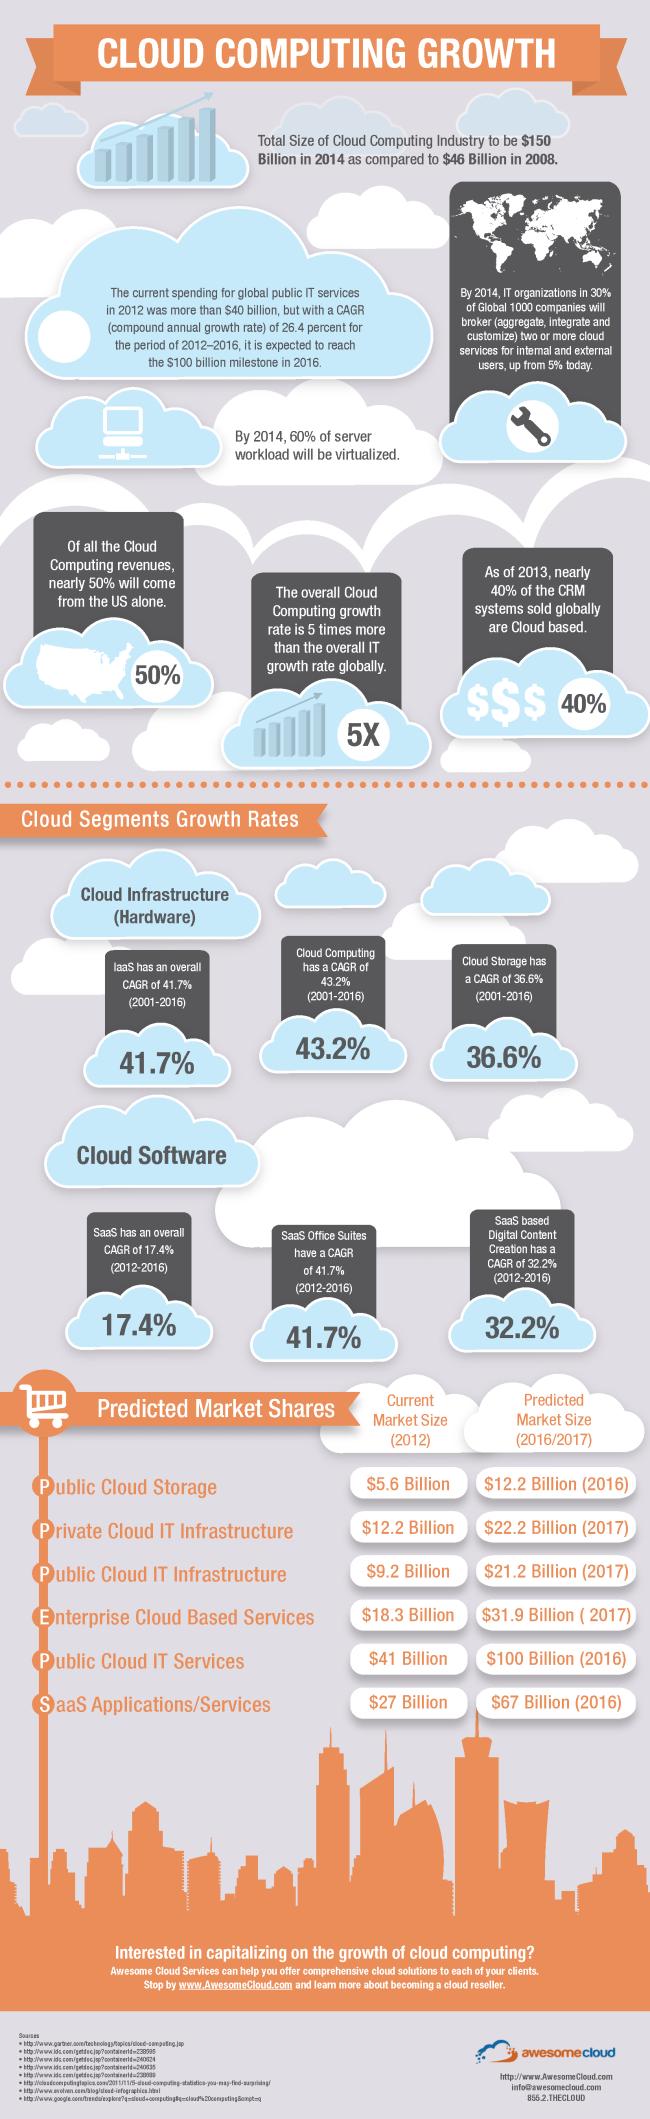 Cloud Computing Growth Infographic